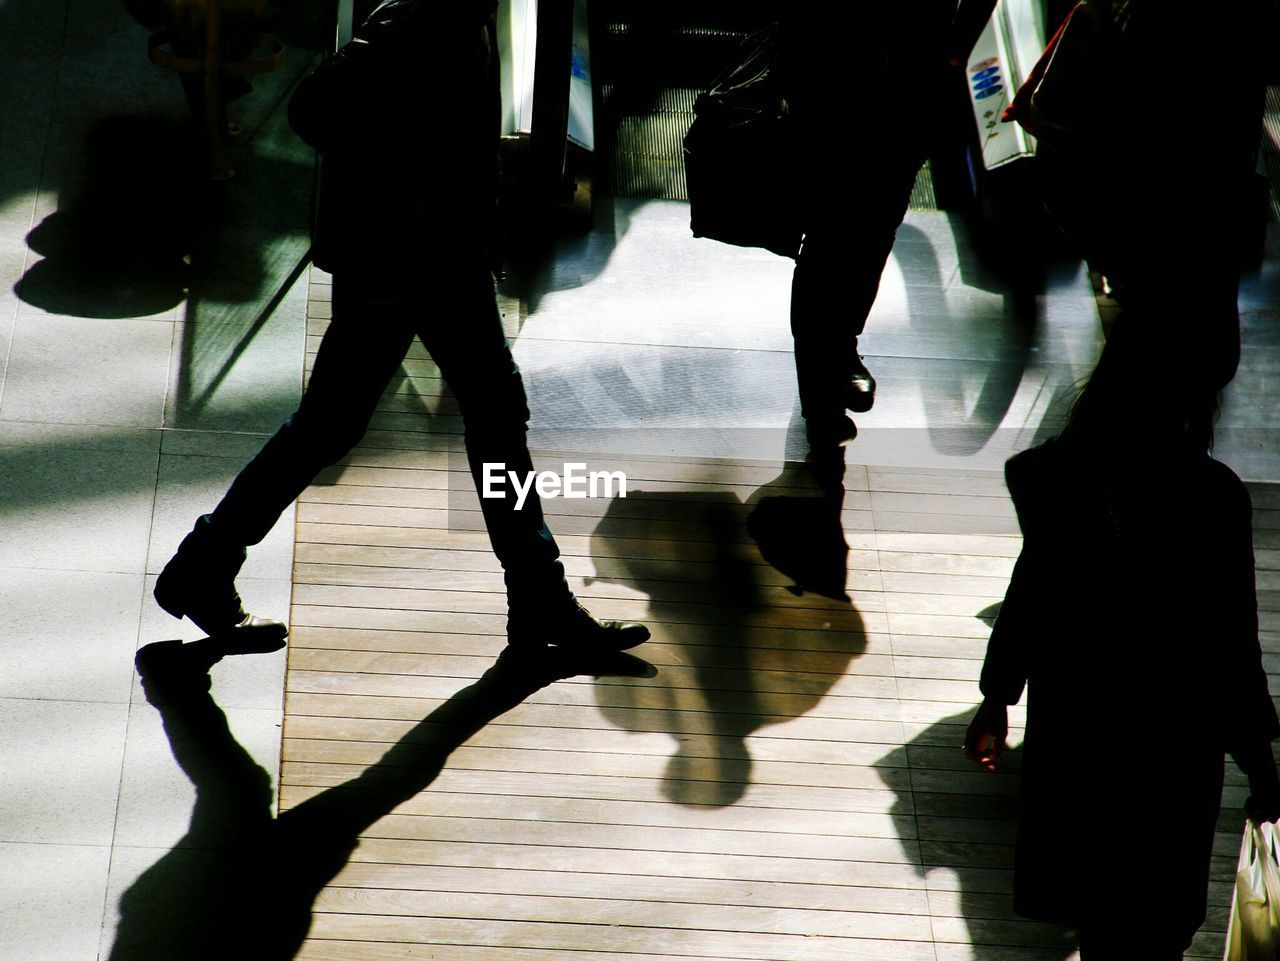 indoors, low section, real people, human leg, group of people, medium group of people, hardwood floor, men, shadow, women, day, standing, lifestyles, full length, people